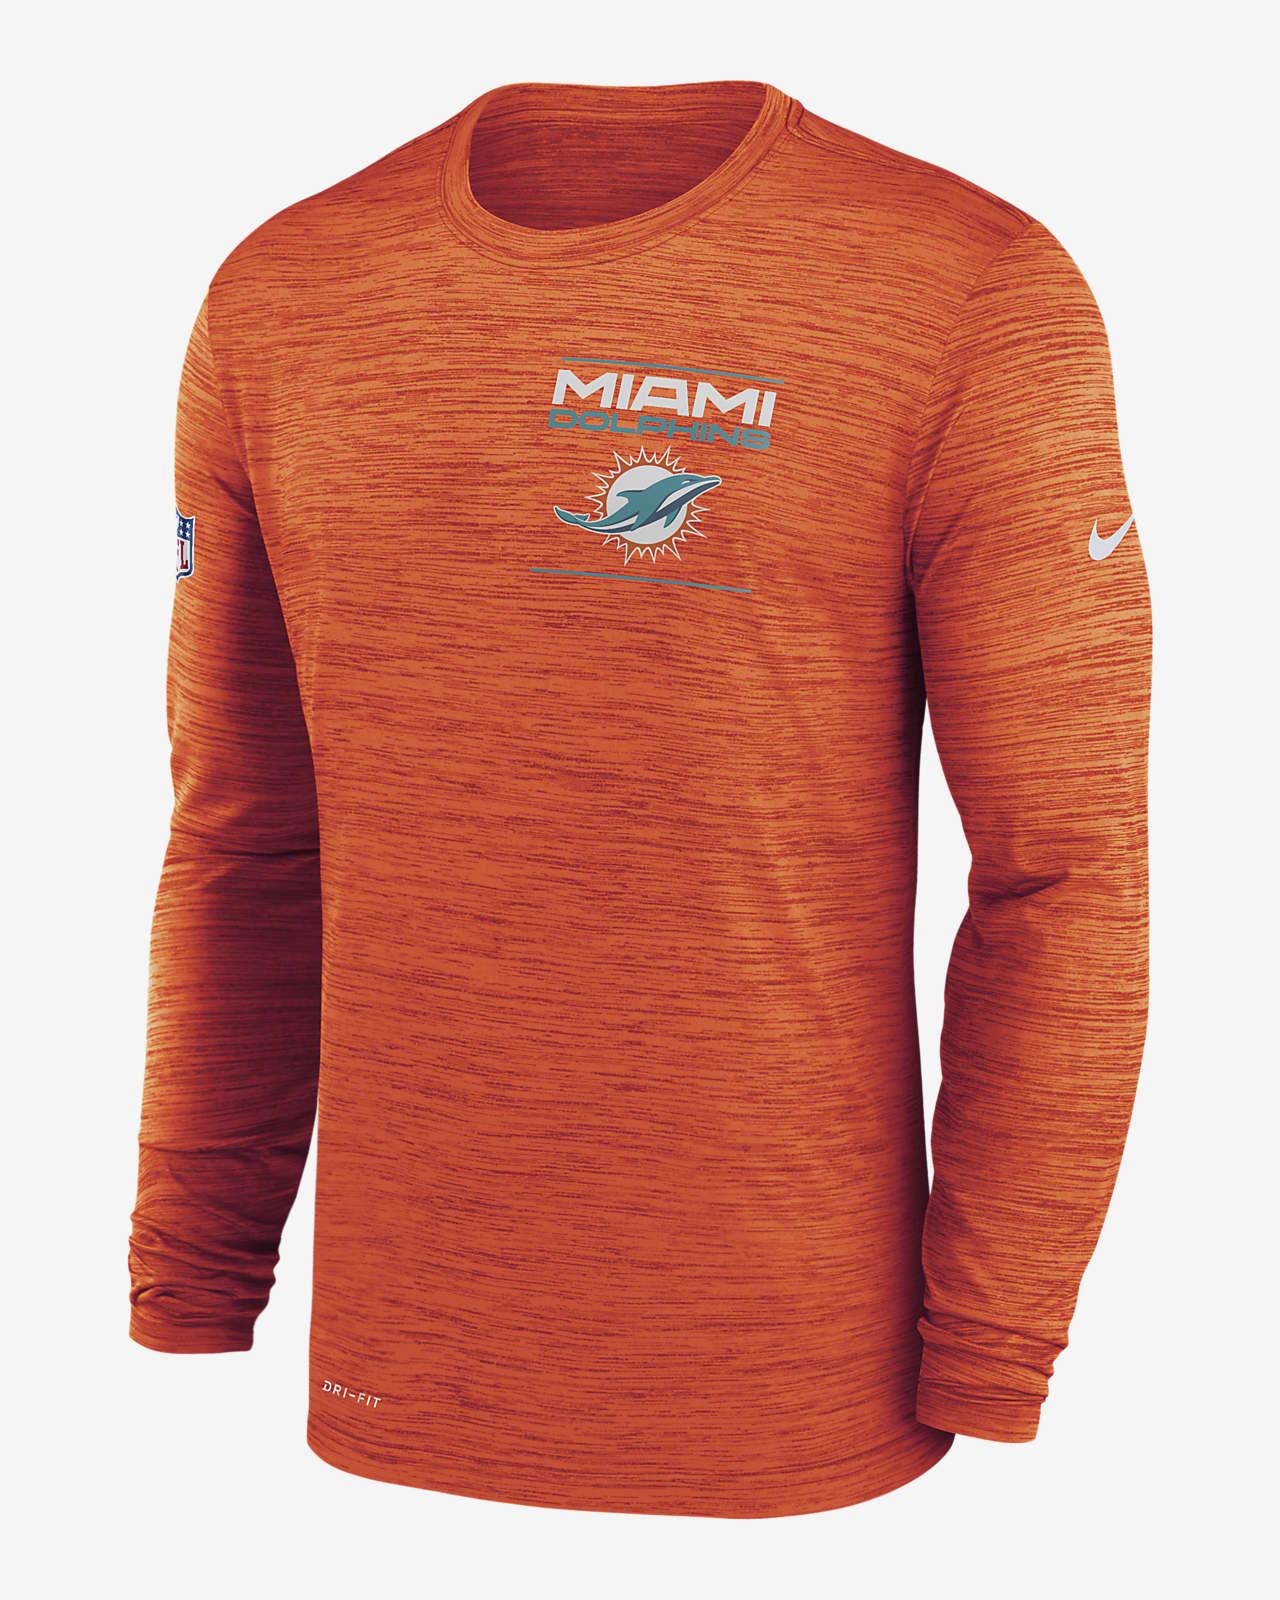 Nike Dri-FIT Sideline Velocity Legend (NFL Miami Dolphins) Men's Long-Sleeve T-Shirt